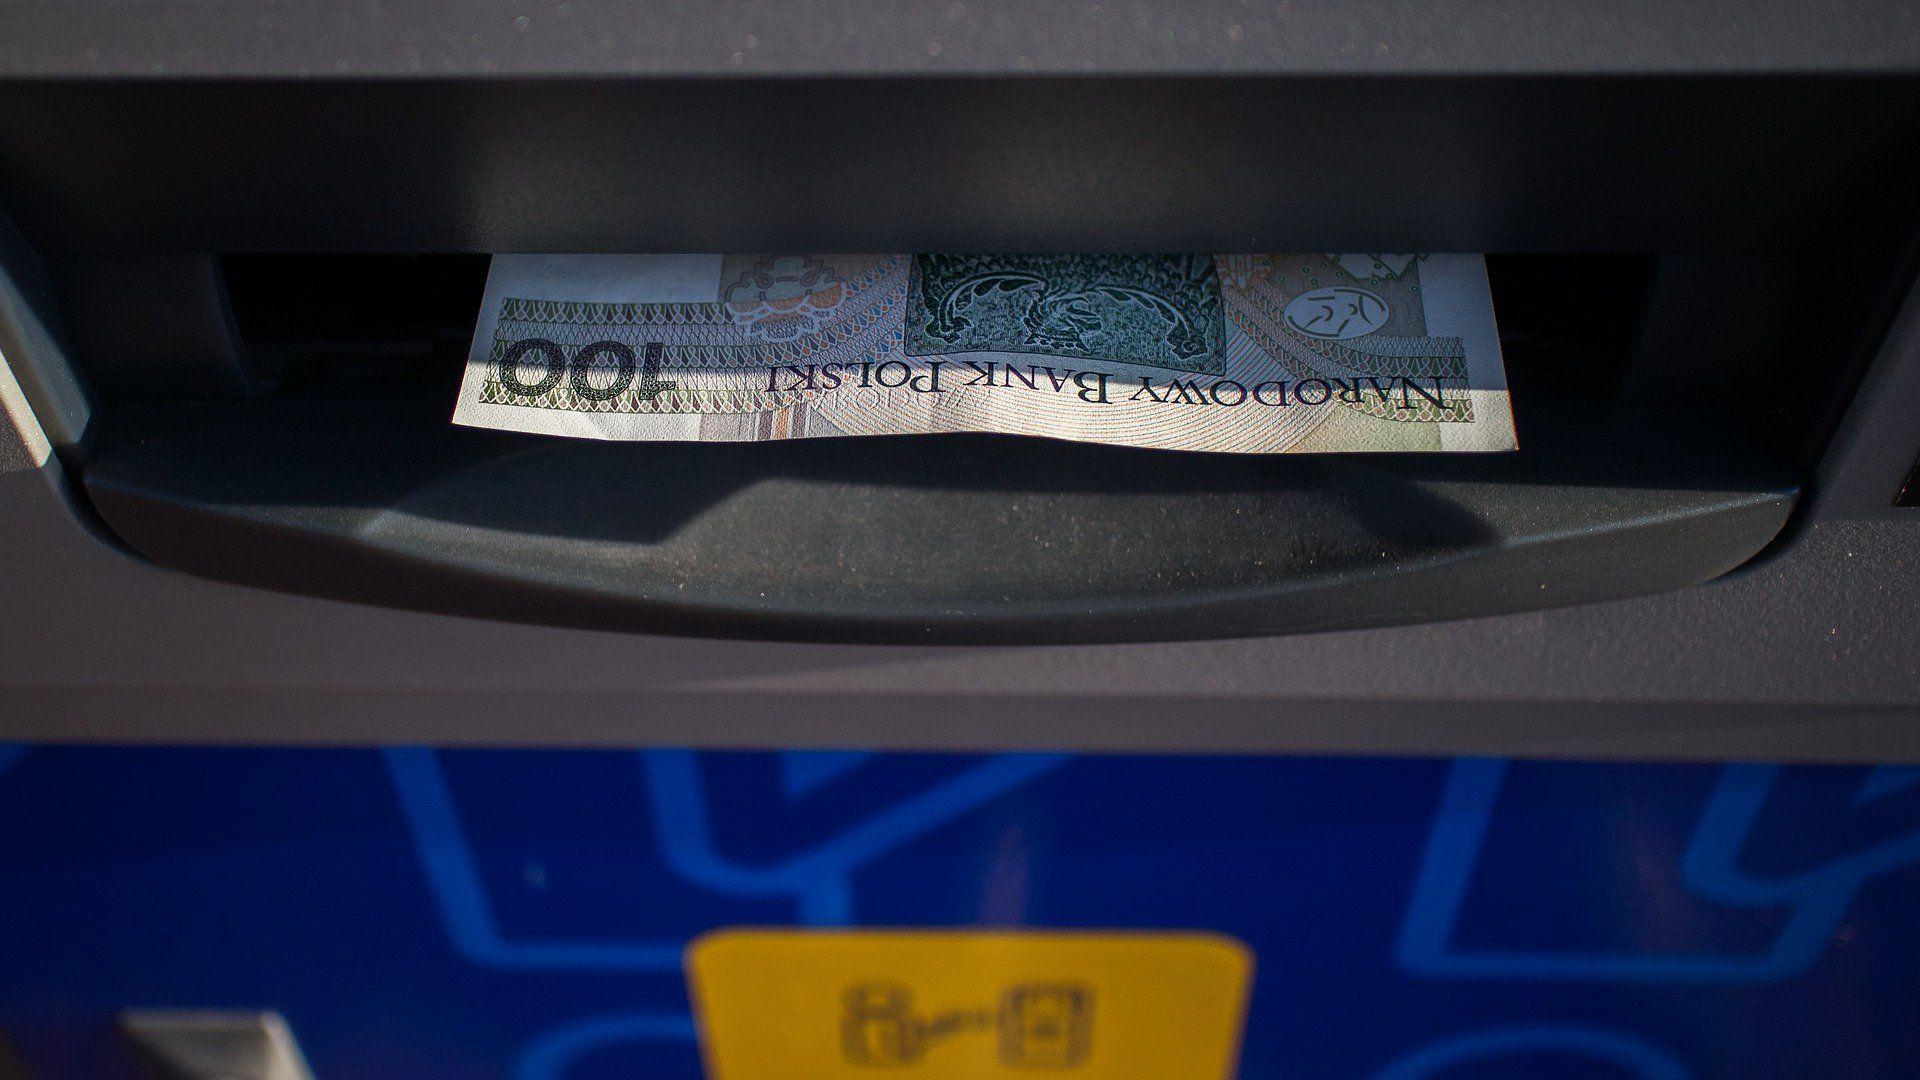 Bankjegy egy ATM bankautomatában